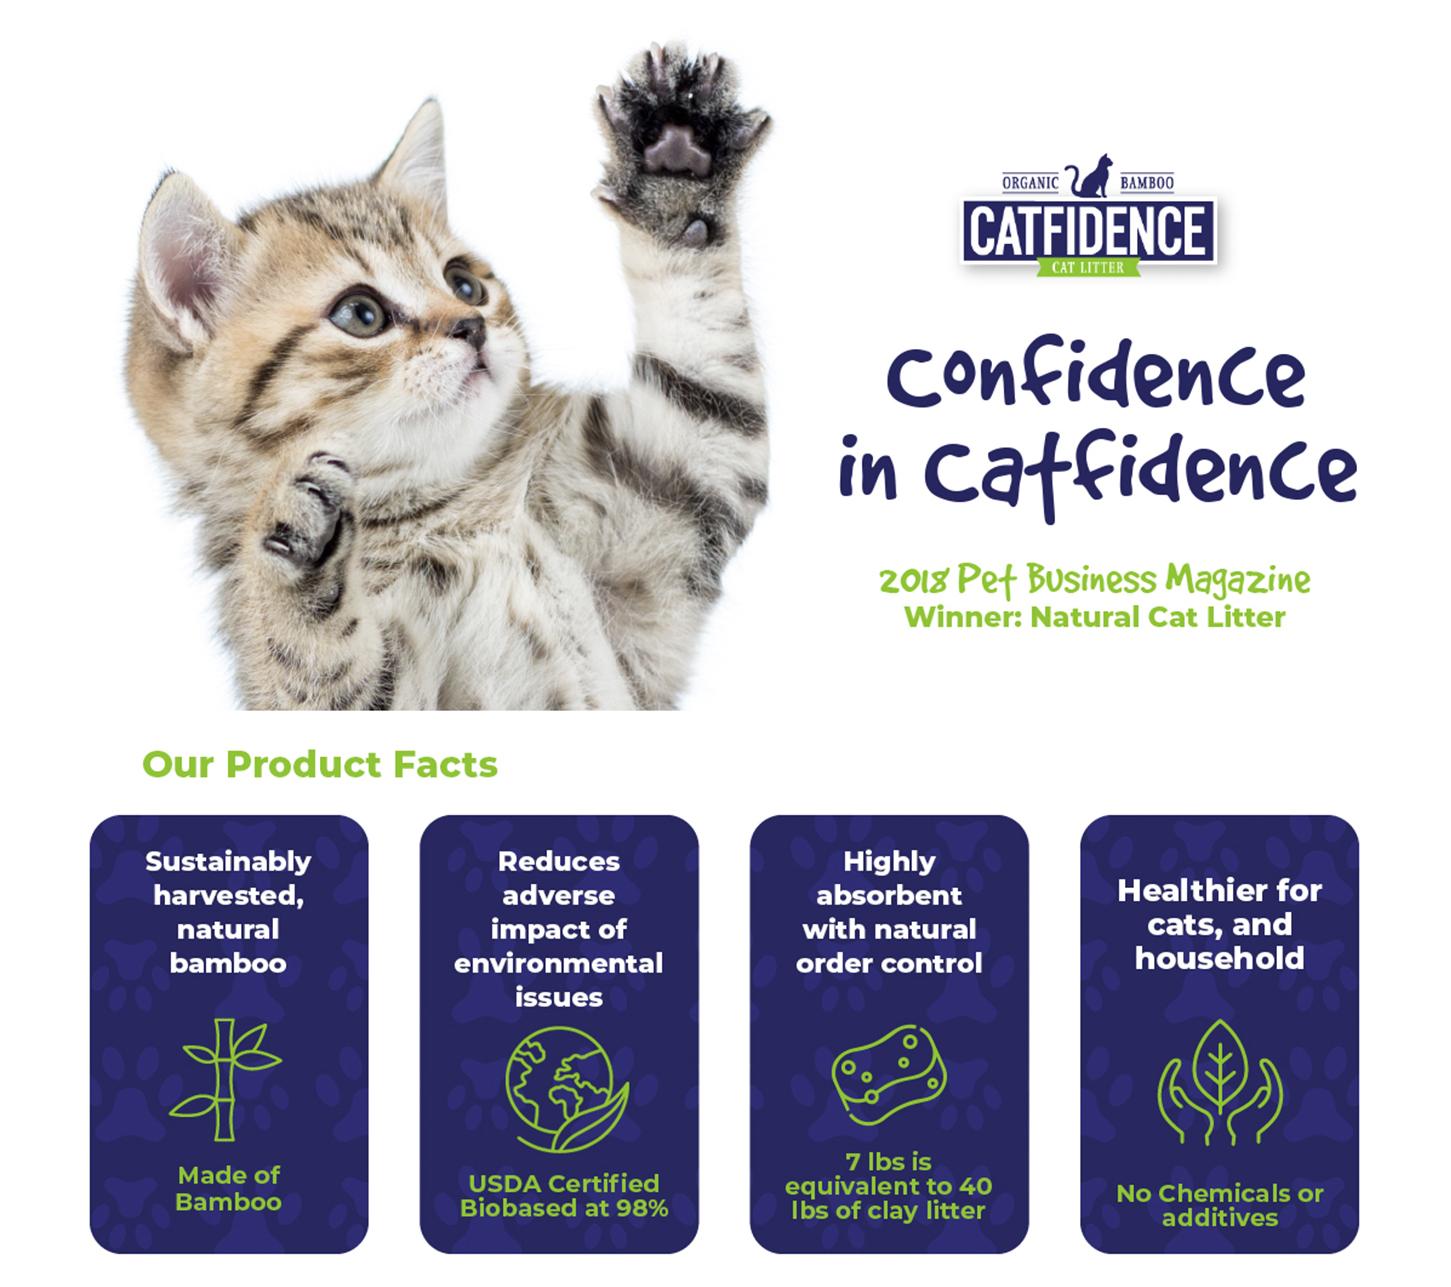 catfidence1.jpg